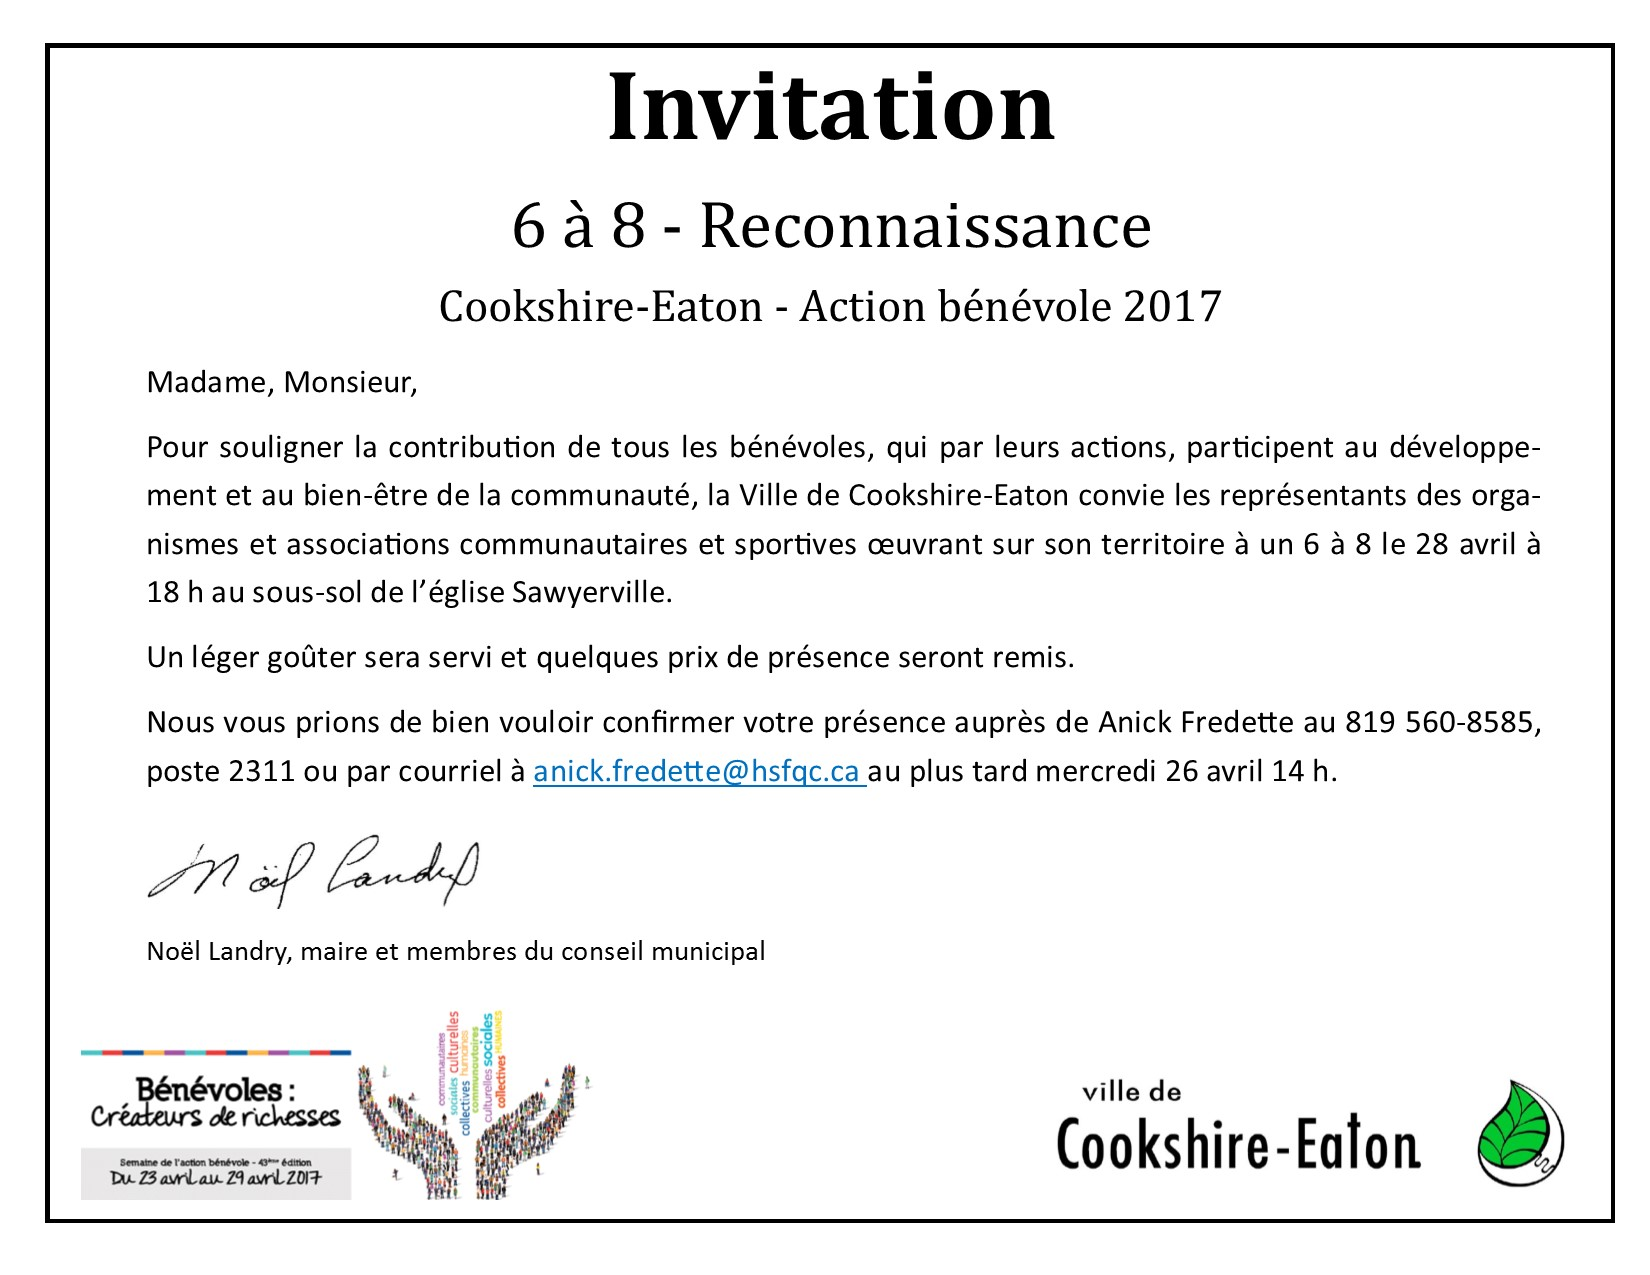 invitation soiree reconnaissance action